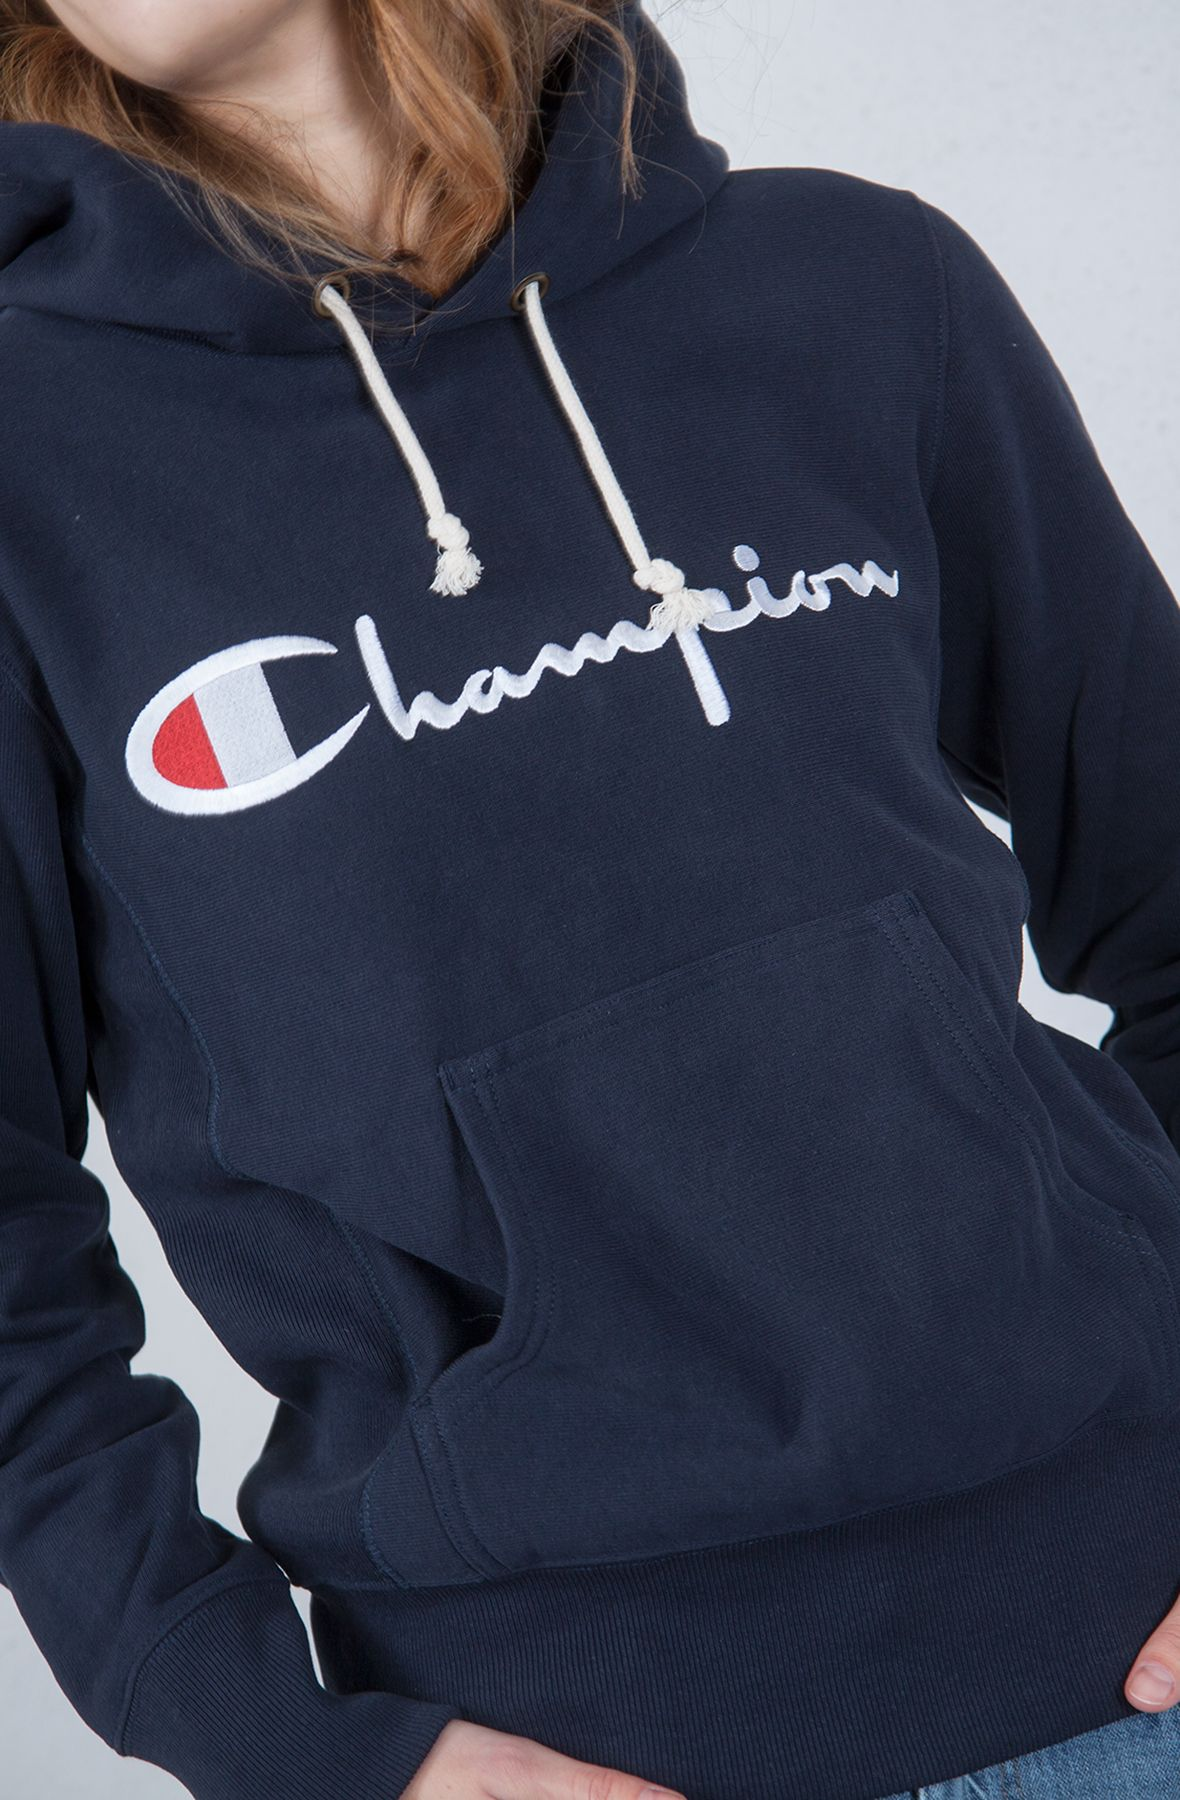 509050d365ef0 ... champion hood, champion logo, champion trend, champion sport, champion  sportswear, champion street, champion streetwear, champion accessories, men  ...